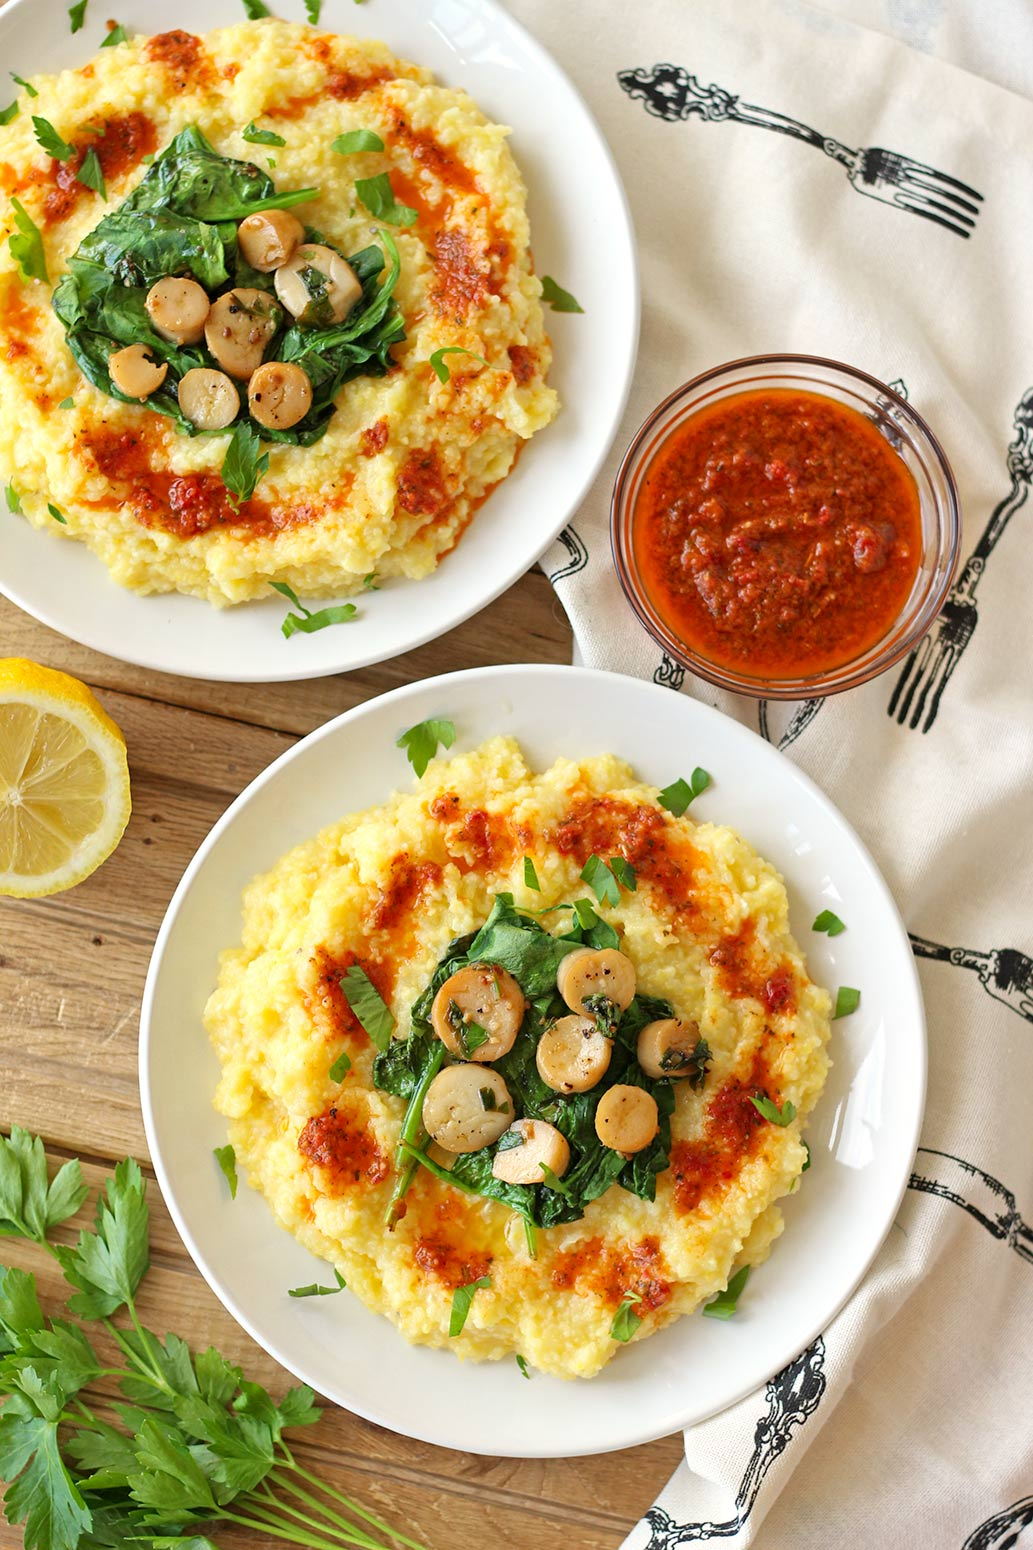 vegan polenta creamy oyster mushroom trumpet scallop scallops sun dried tomato puree spinach lemon butter vegetarian bay zenaznzaatar zena n zaatar food blog recipe